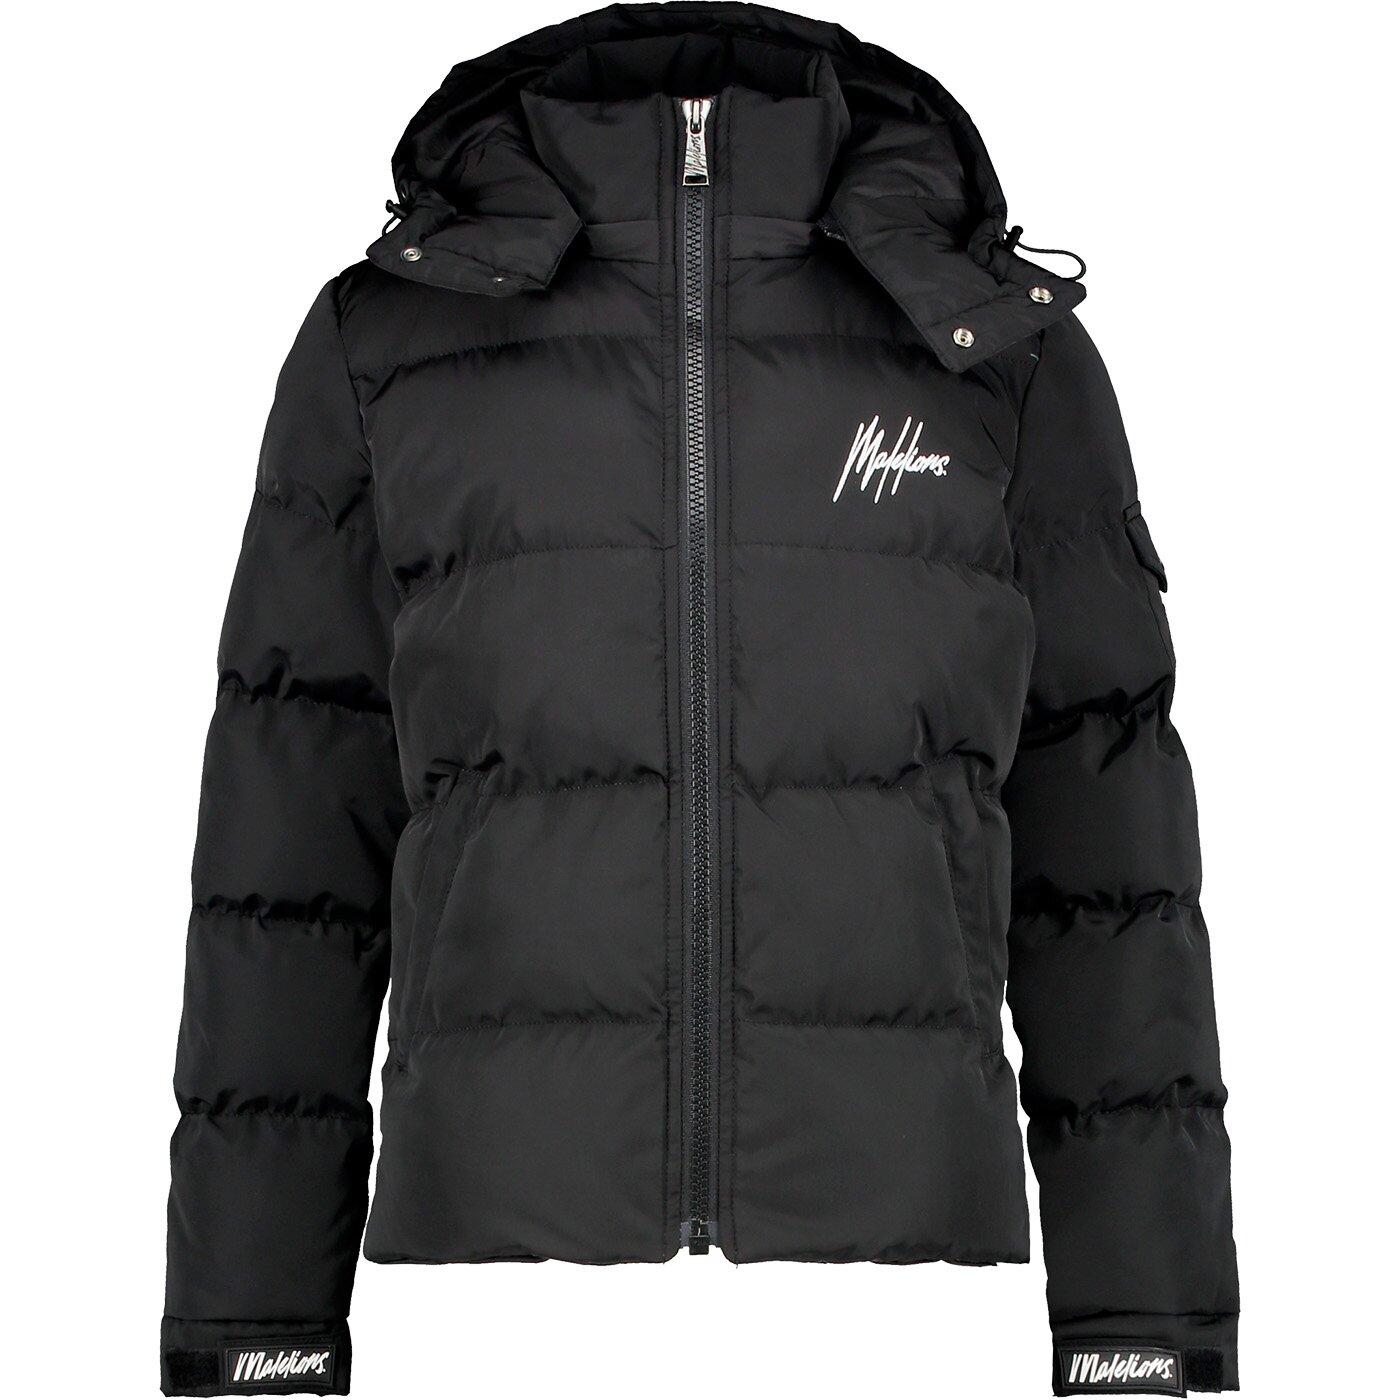 Malelions winterjas MJ-AW21-1-03 zwart met gratis pet